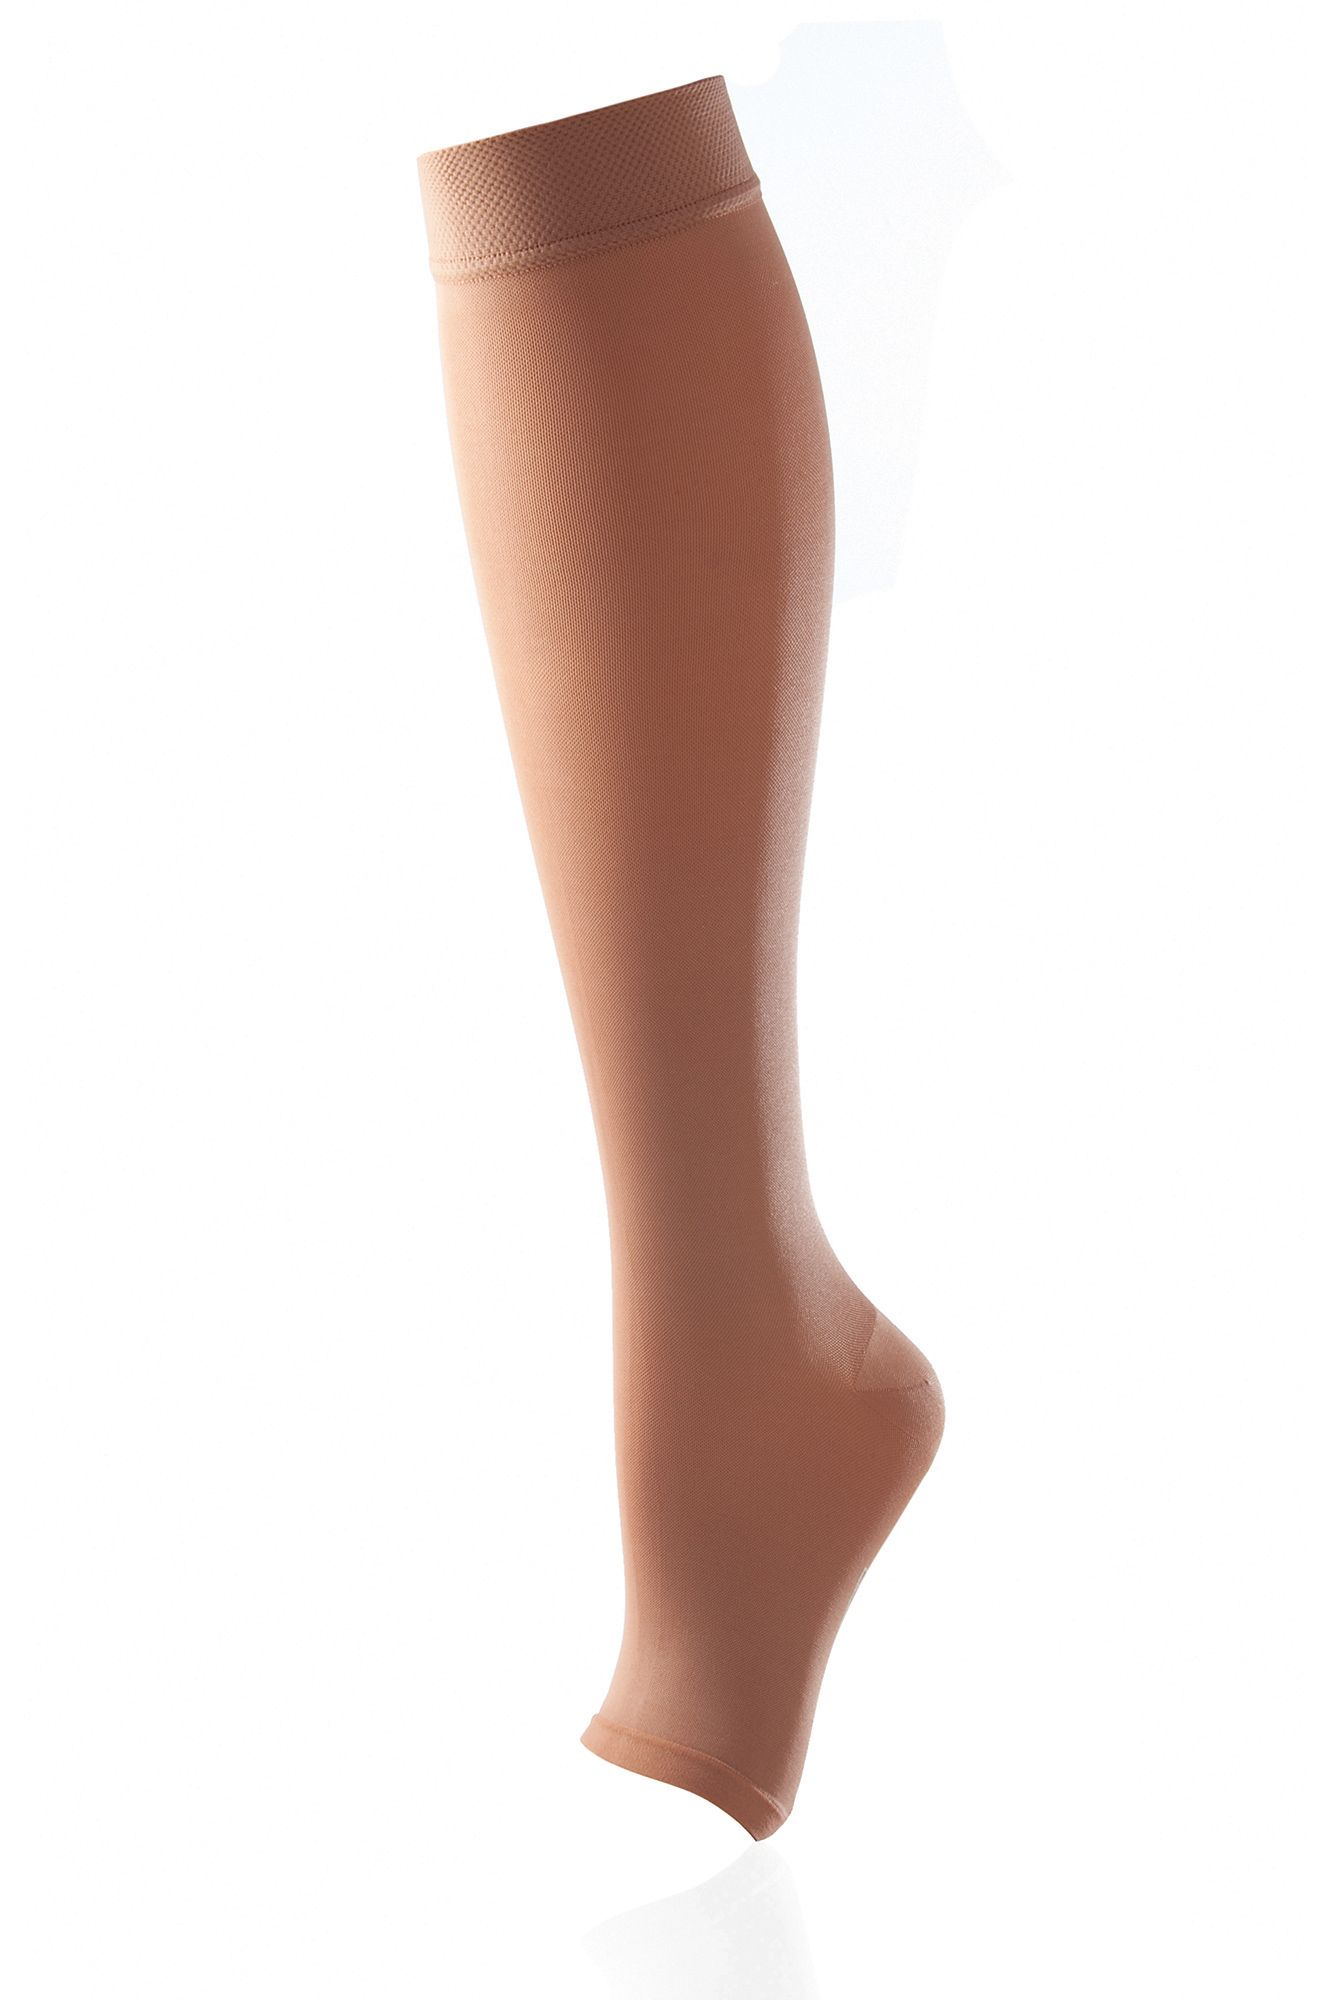 activa class 1 below knee support stockings daylong